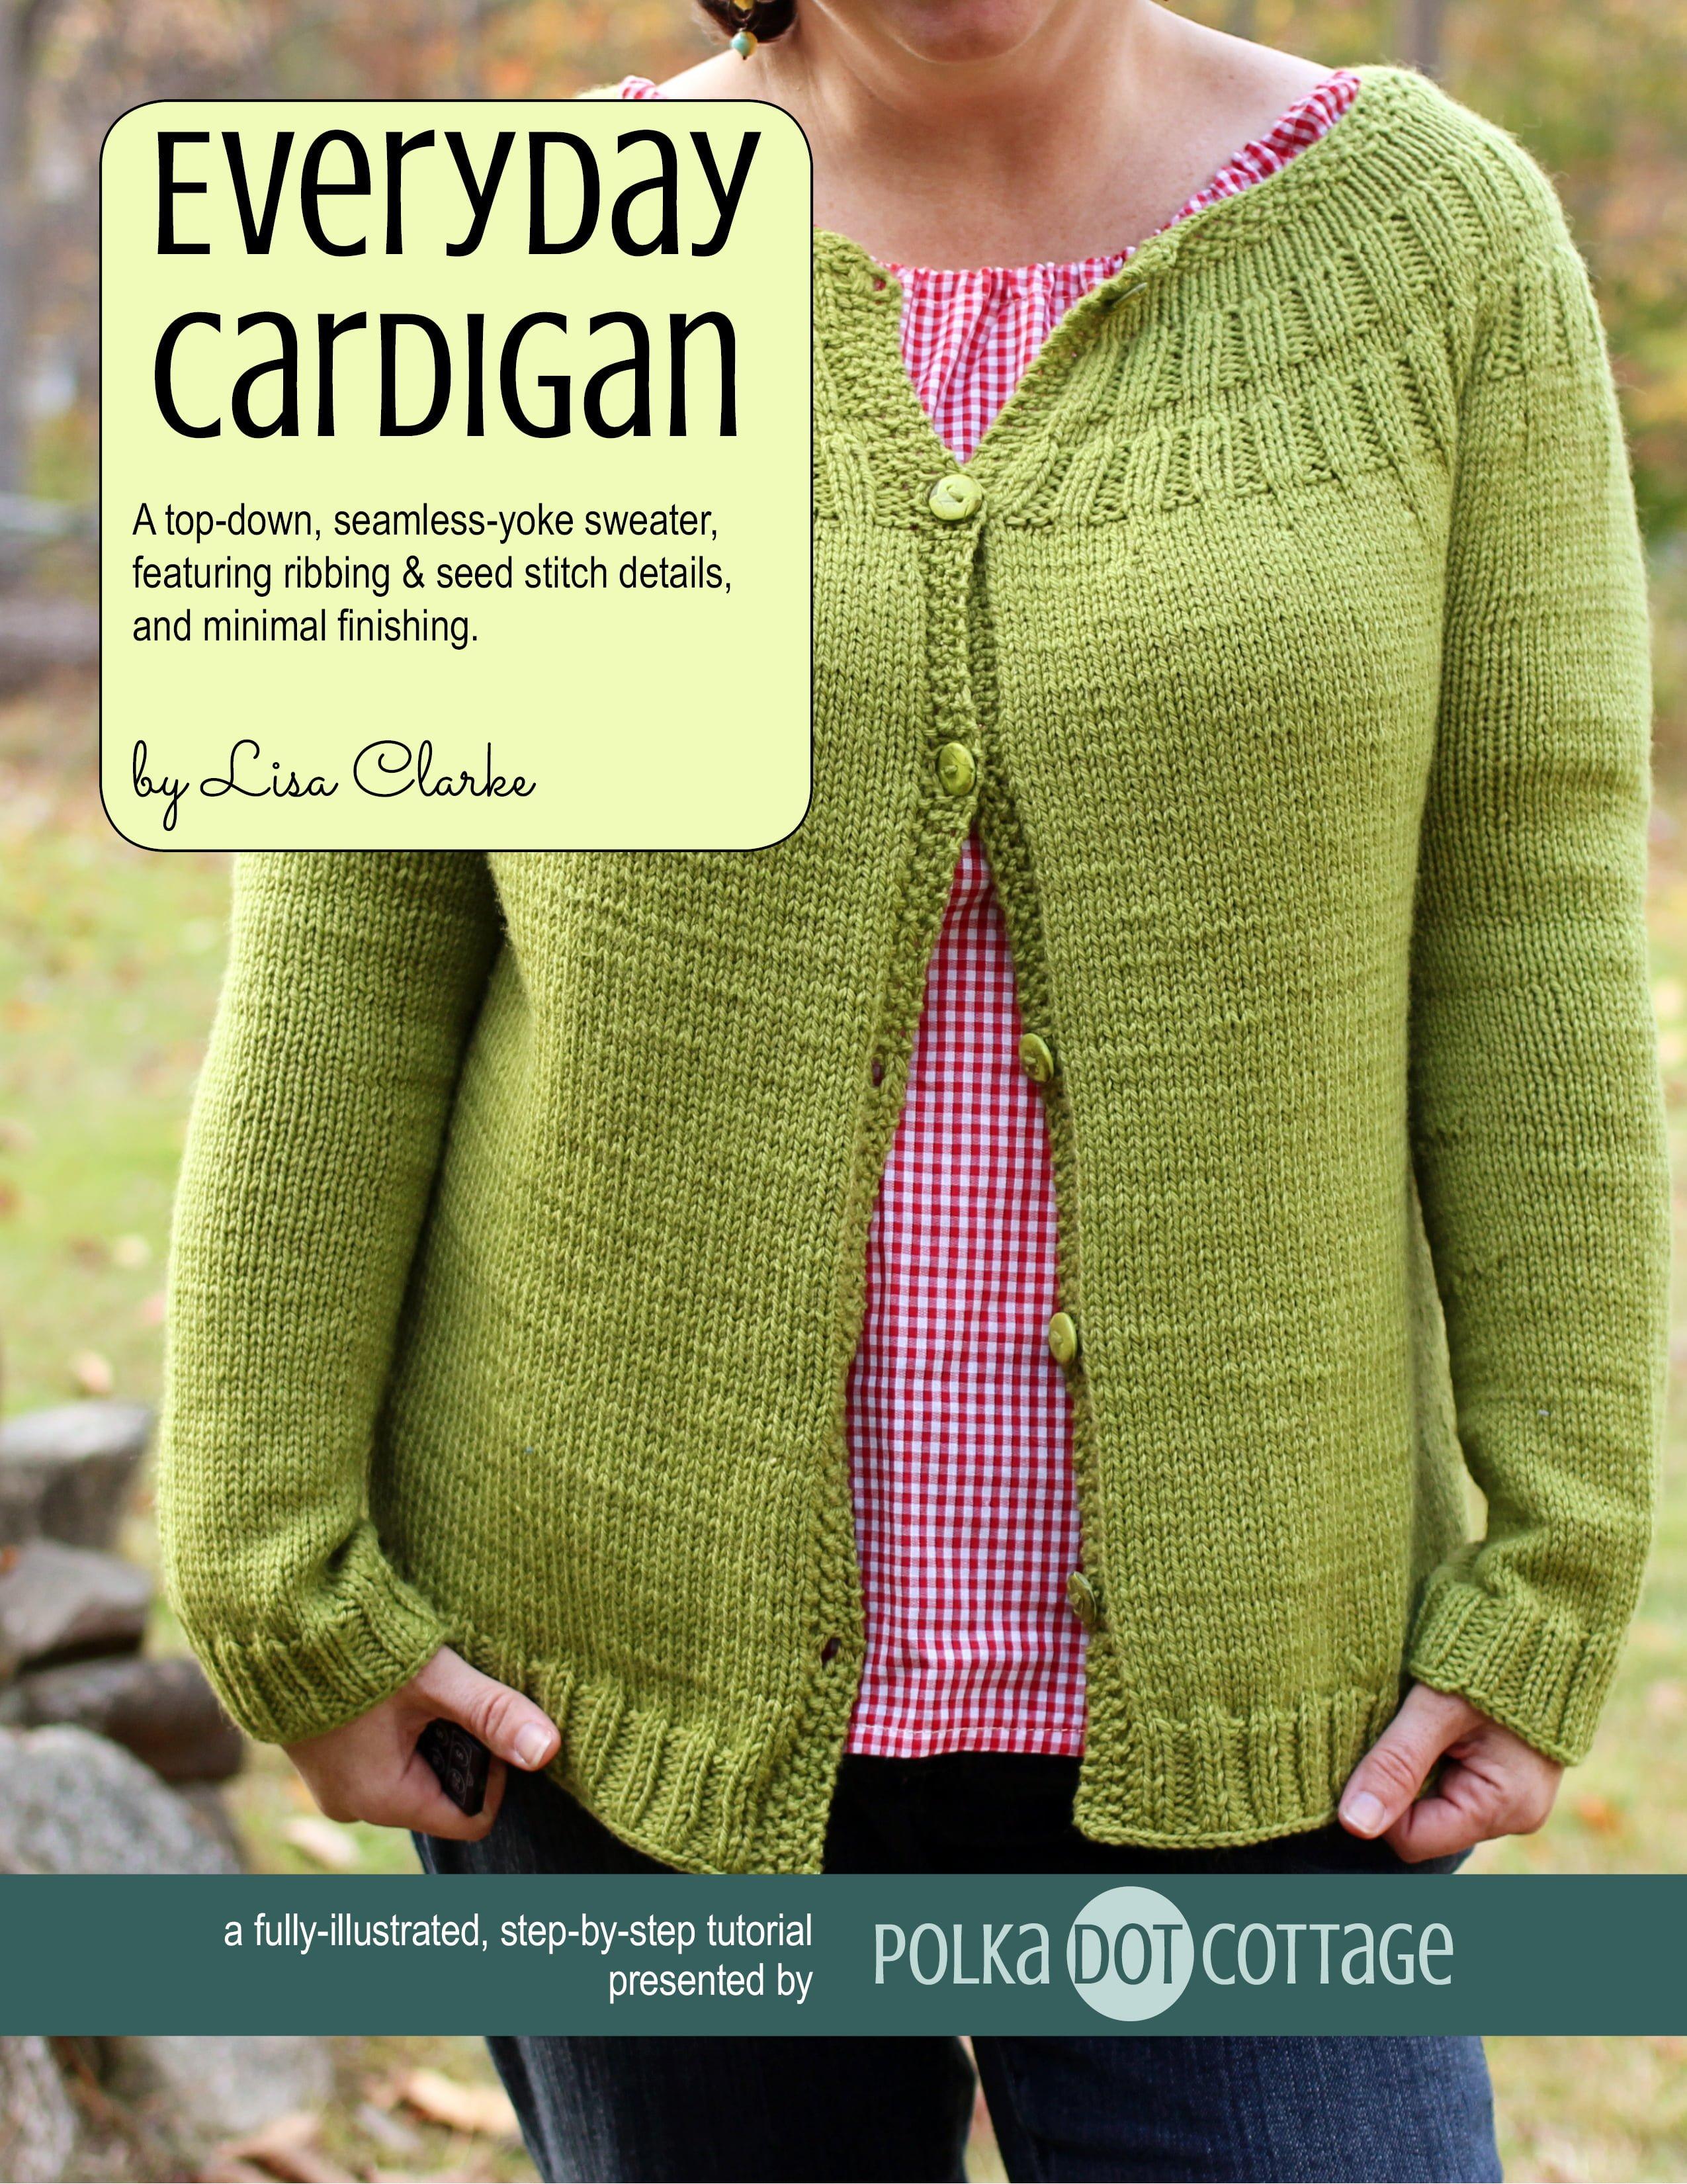 Everyday Cardigan ⋆ Polka Dot Cottage